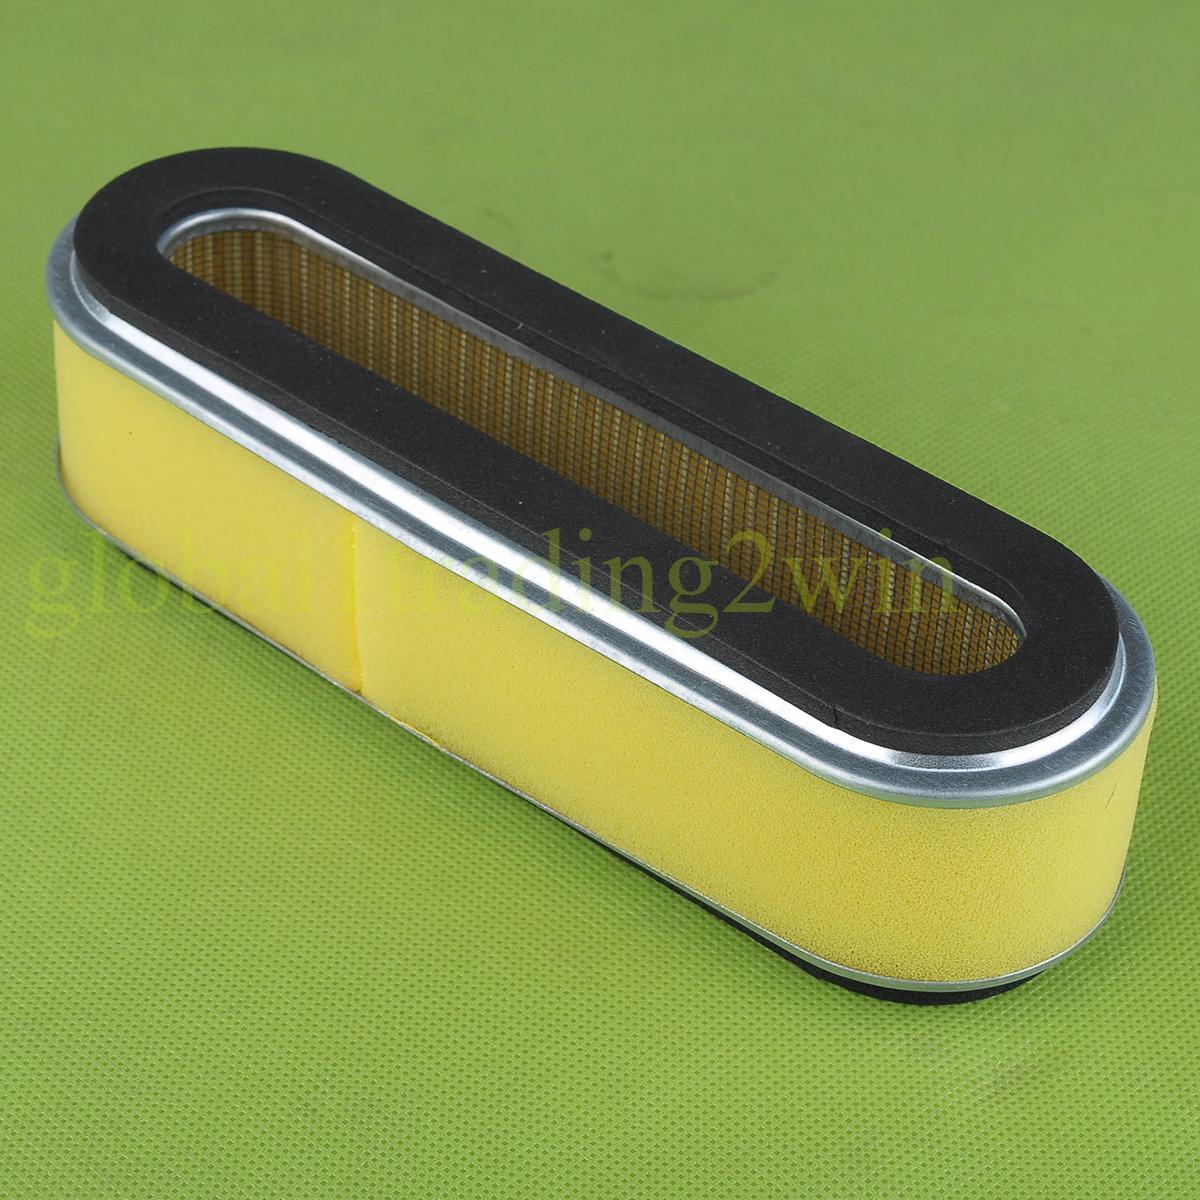 003 Luftfilter f/ür Honda GV200/GXV120/hr214/hr194/hr195/hra214/Rasenm/äher # 17210-ze6 505/17210-ze6